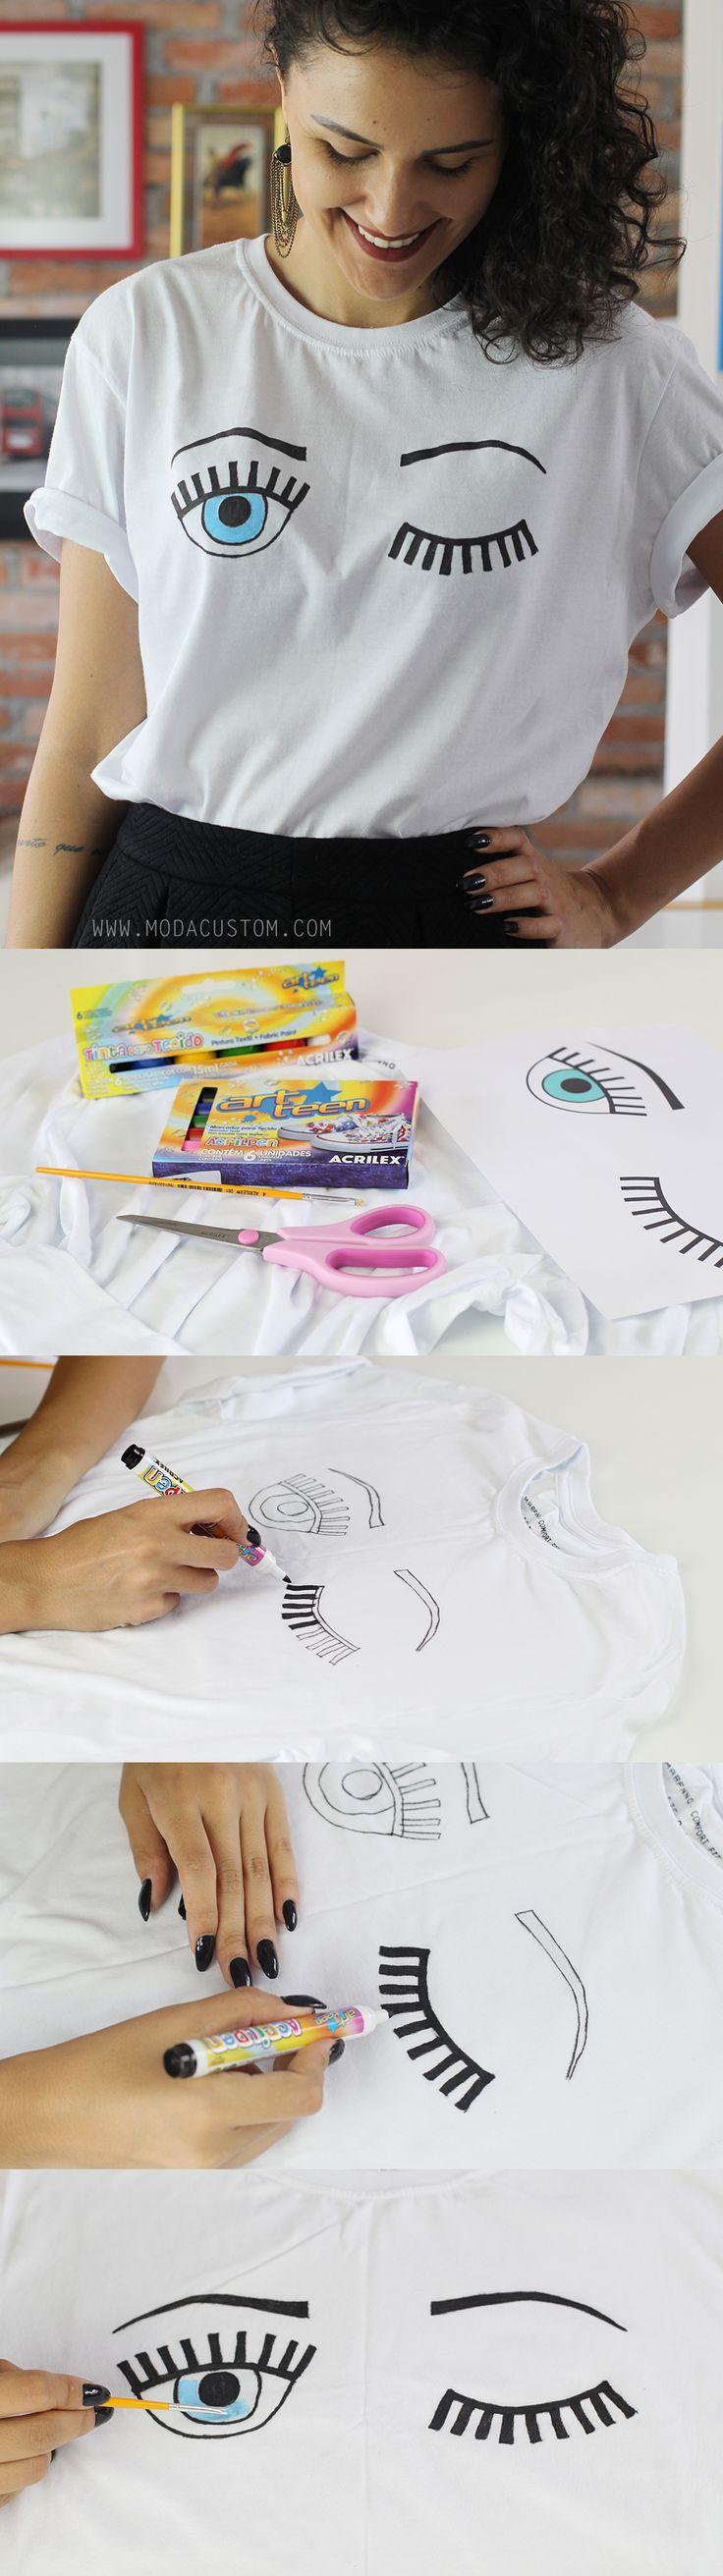 Tutorial camiseta cílios no blog: http://modacustom.com.br/2016/03/01/tutorial-camiseta-com-estampa-de-cilios/